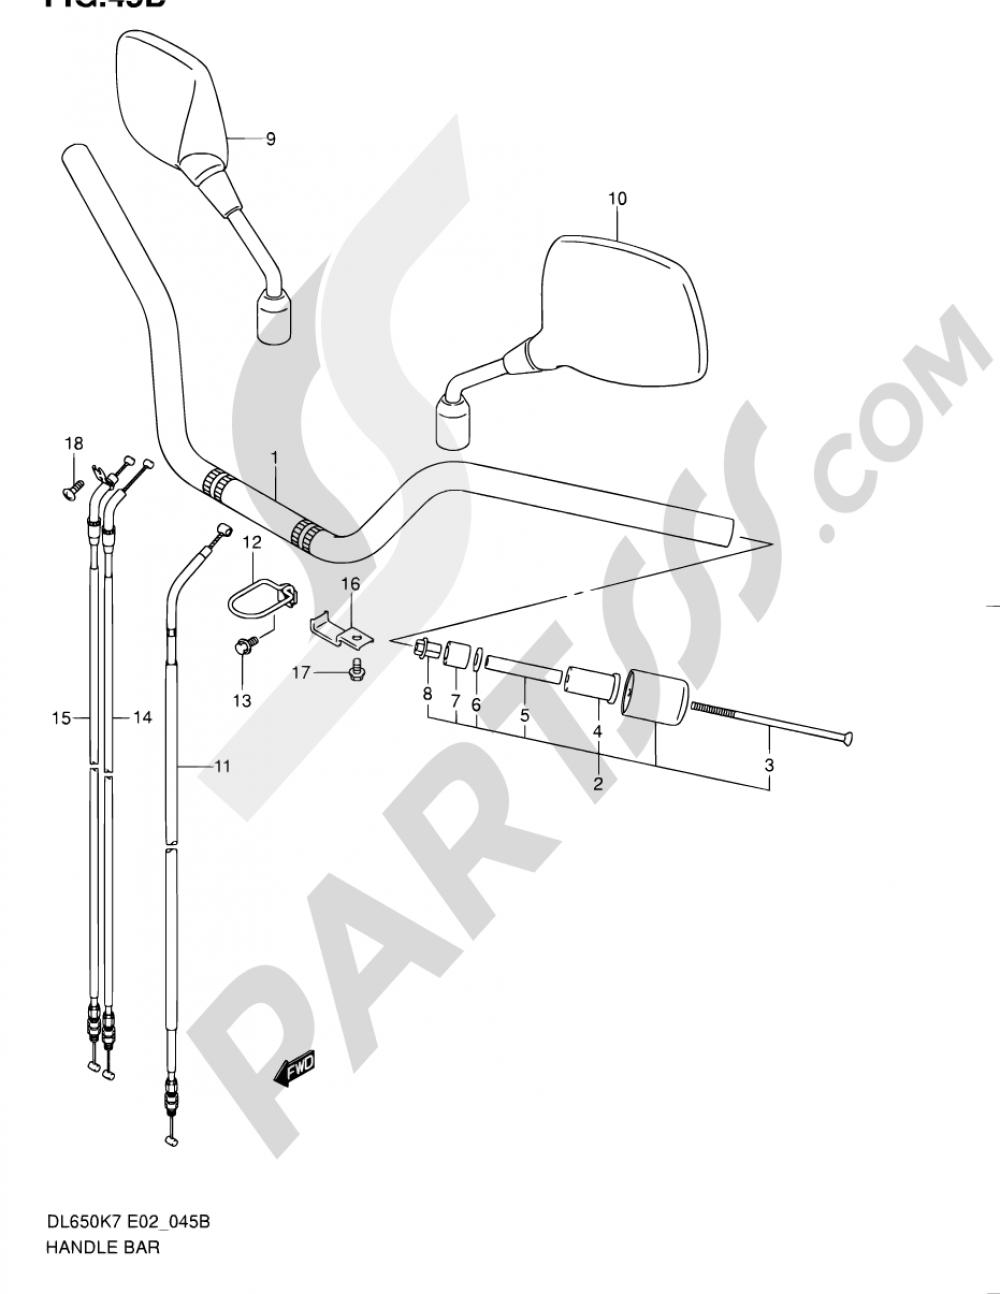 45B - HANDLEBAR (MODEL K9 P37/MODEL L0) Suzuki VSTROM DL650 2008